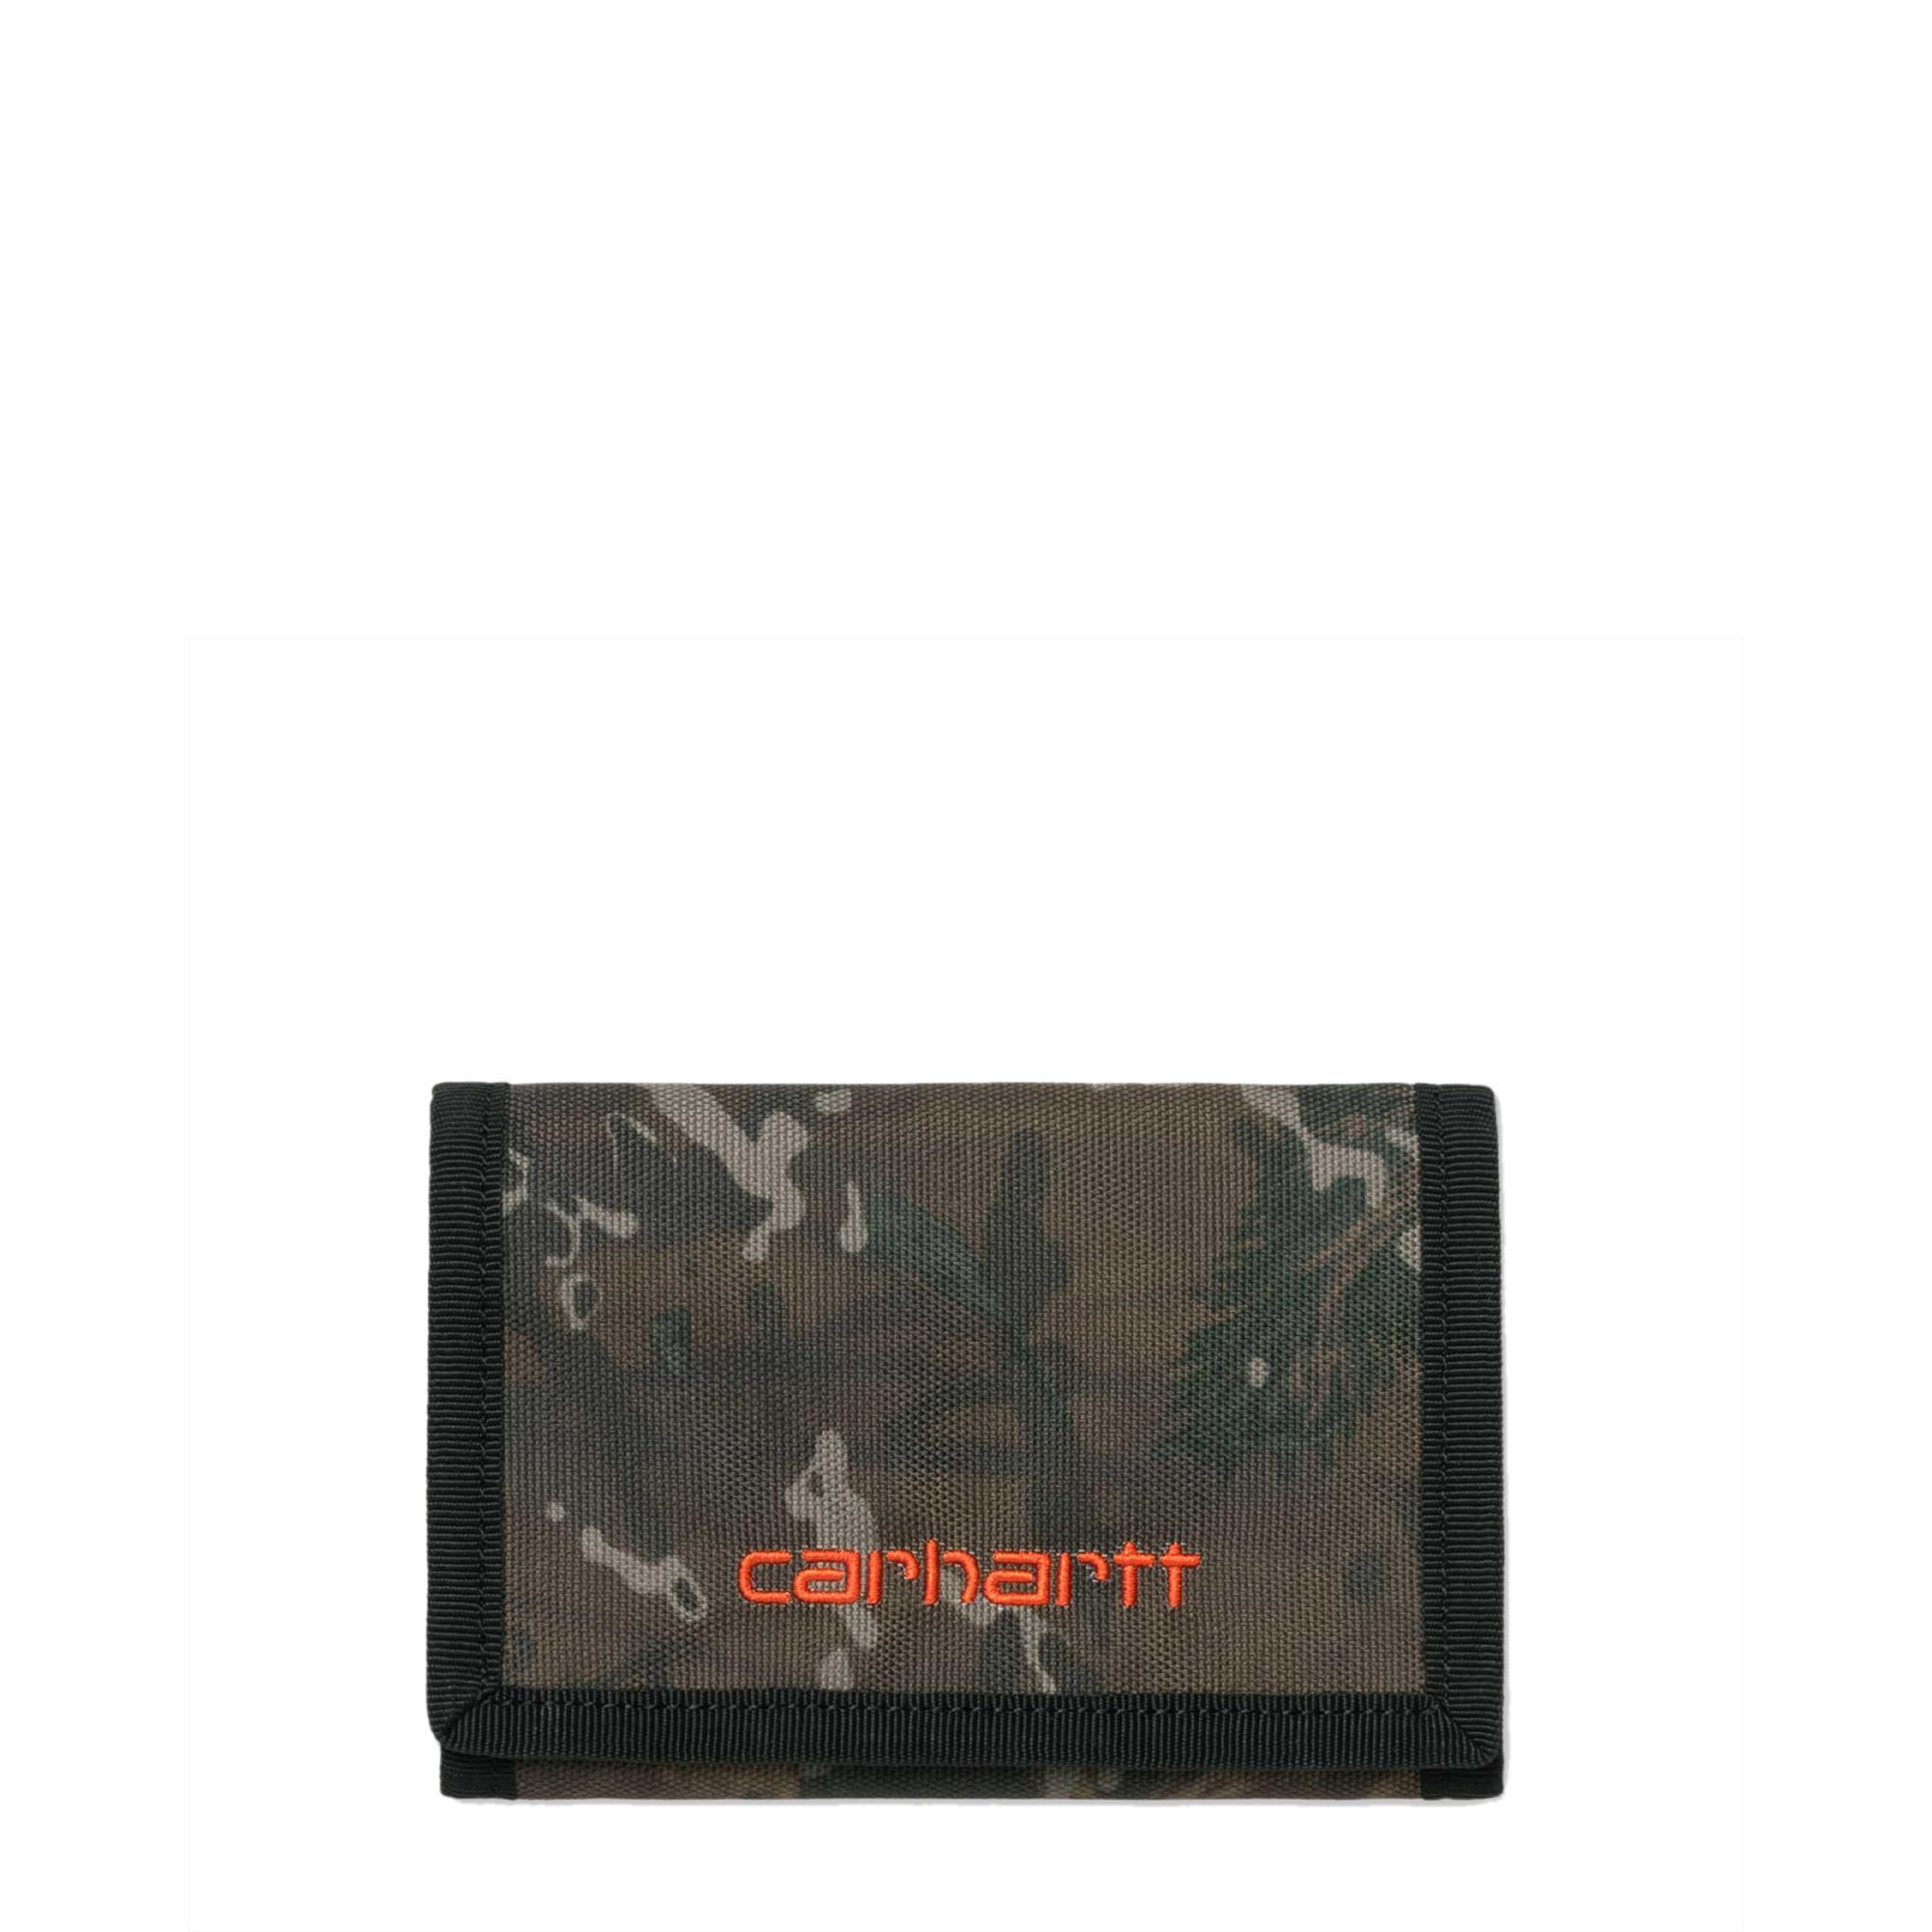 Carhartt Payton Wallet Camo combi safety orange